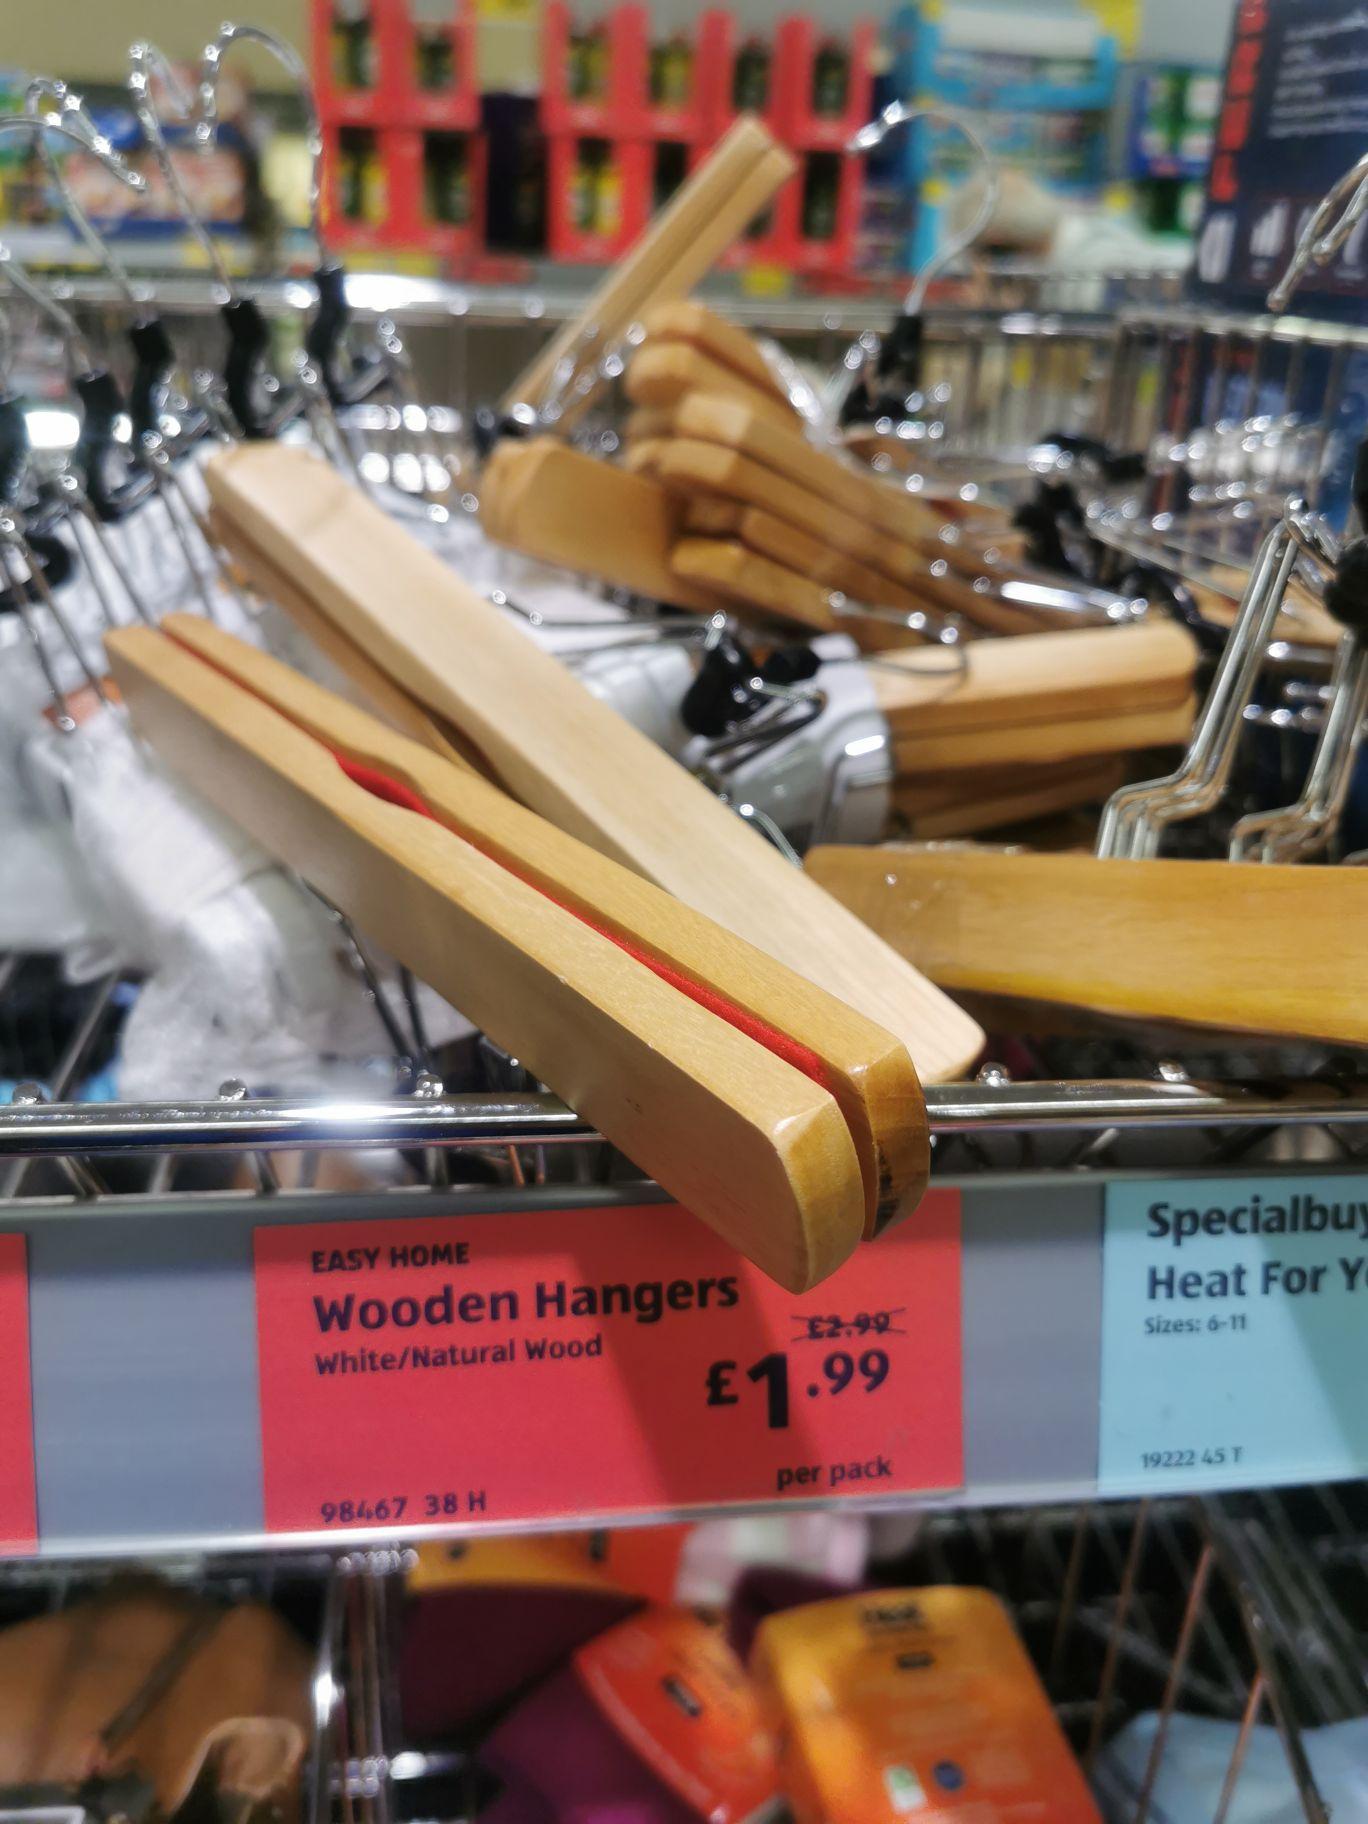 Wooden Hangers (Five Pack) £1.99 at Aldi